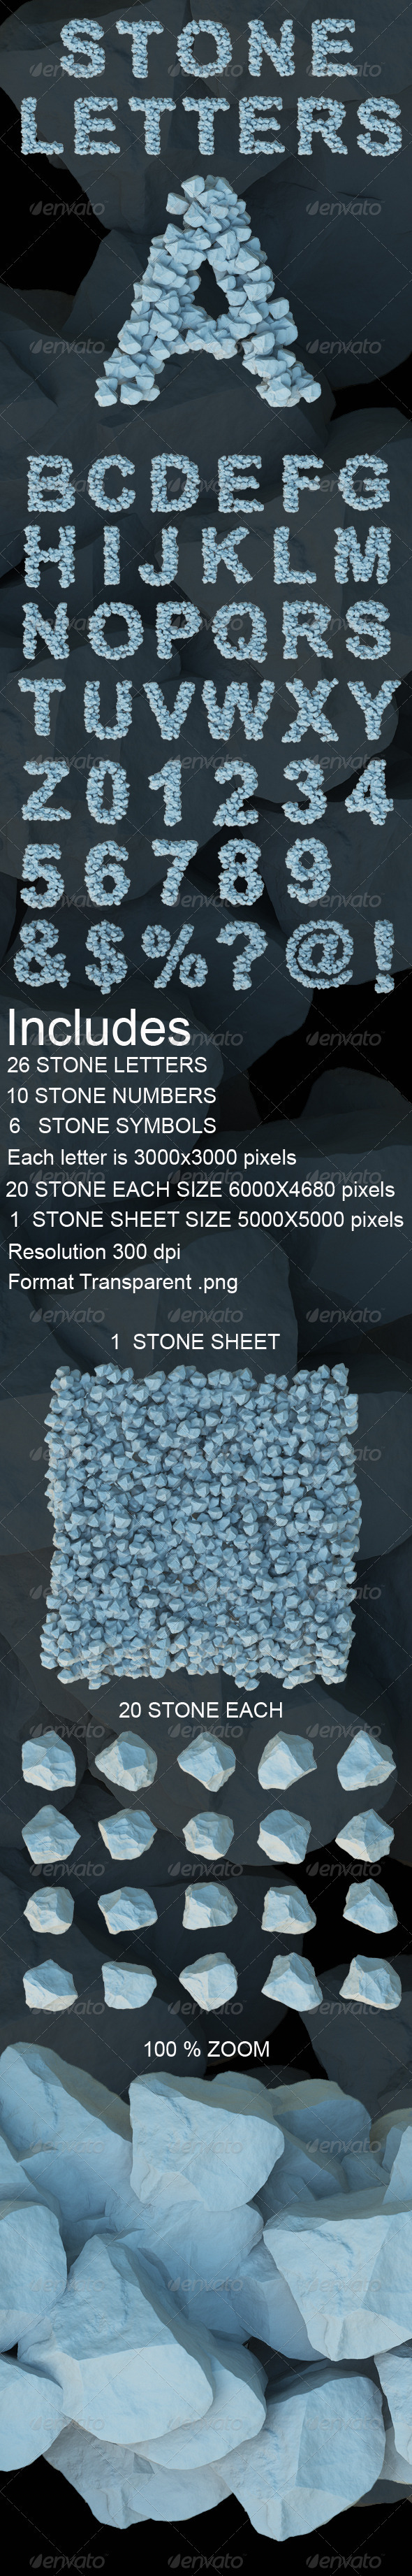 3D Stone Letters - Text 3D Renders